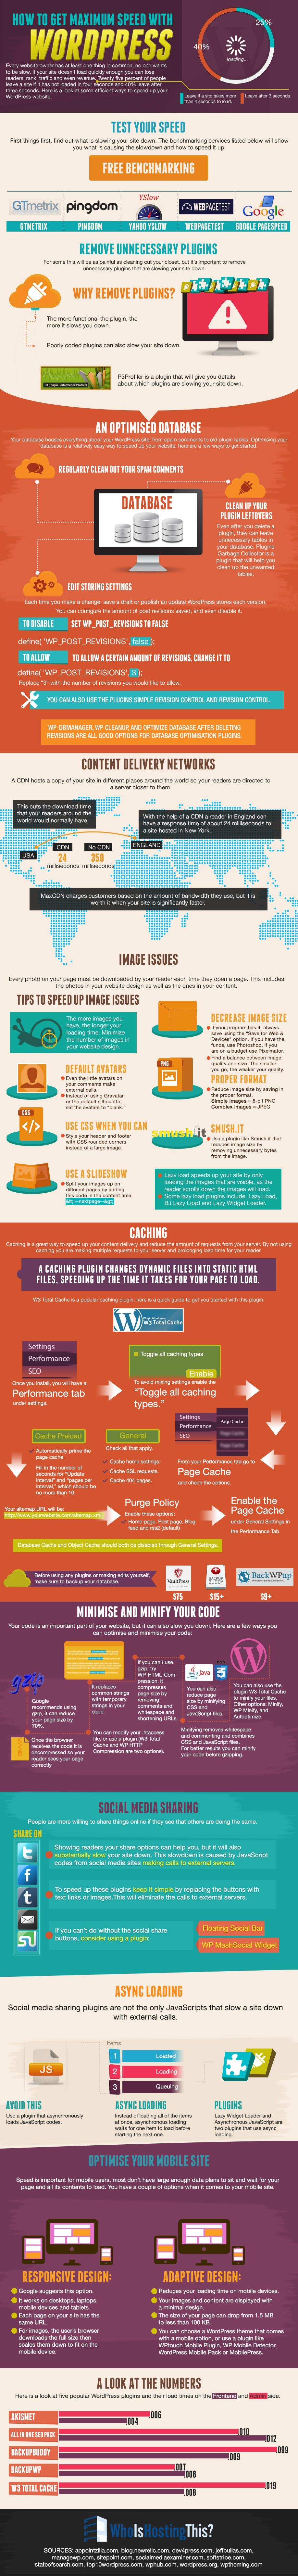 wordpress speed infographic